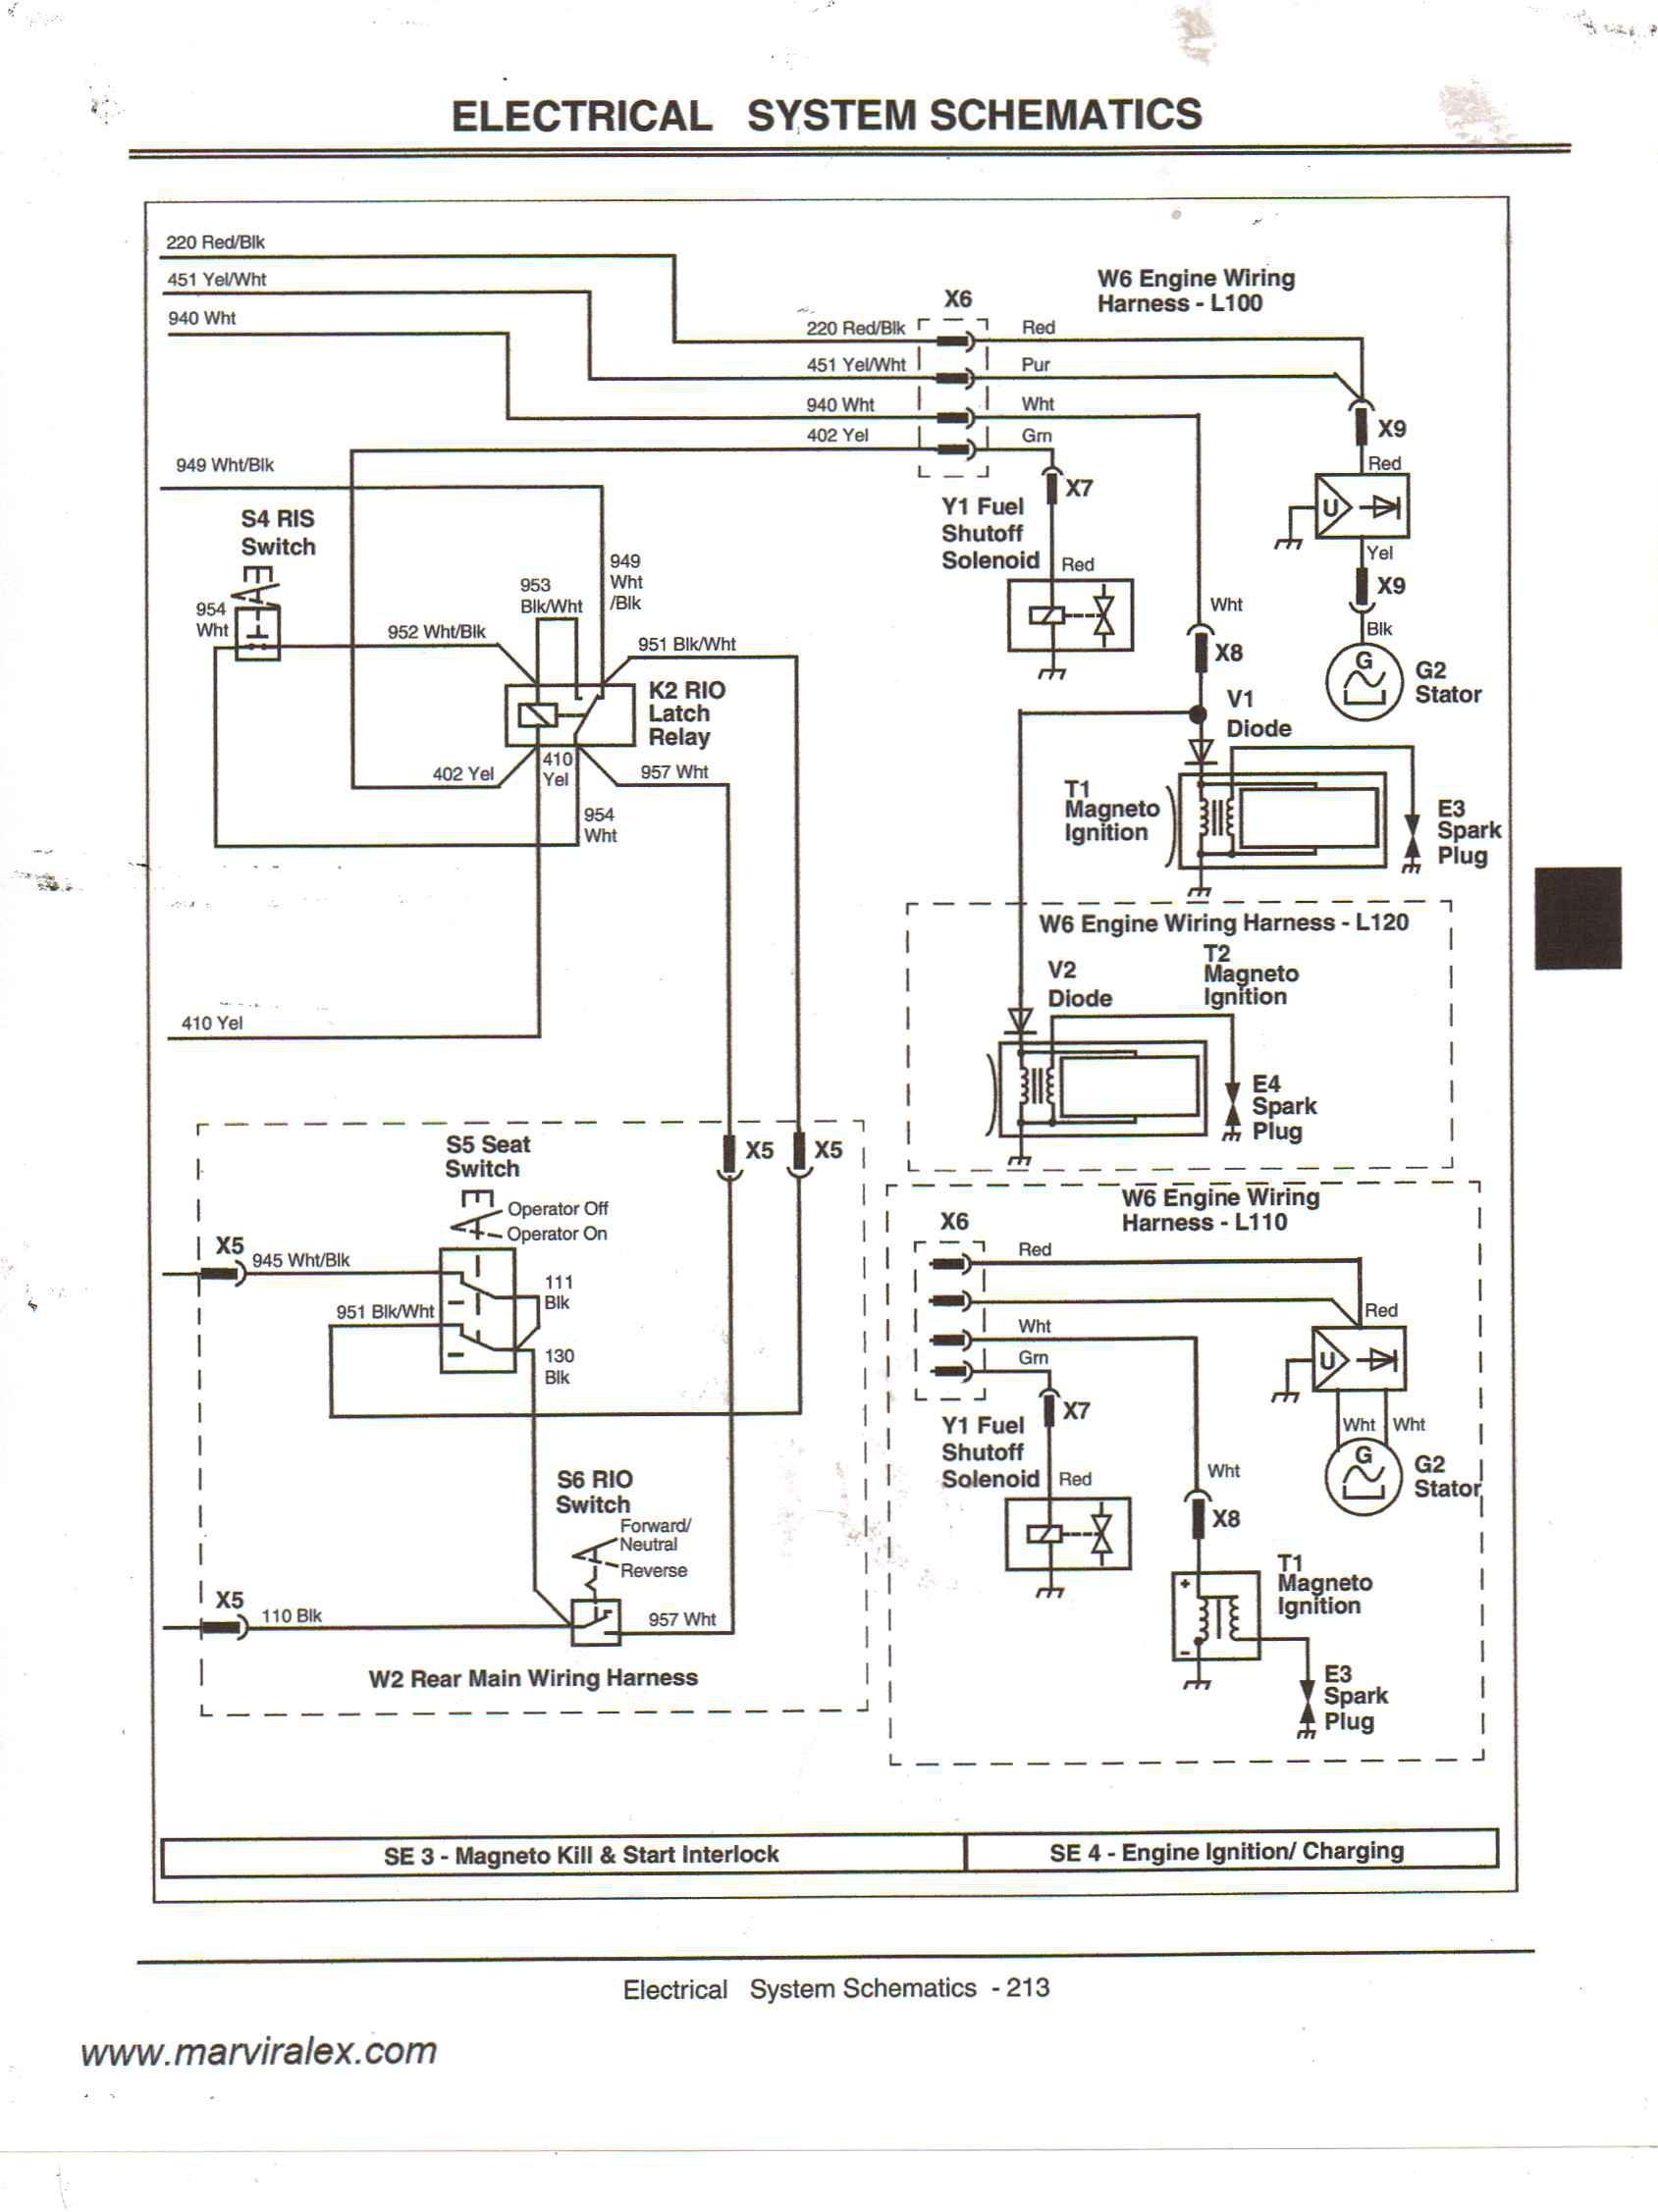 John Deere Gator Engine Parts Diagram John Deere Wiring Diagram John Deere Gator Revised Part Diagram John Of John Deere Gator Engine Parts Diagram